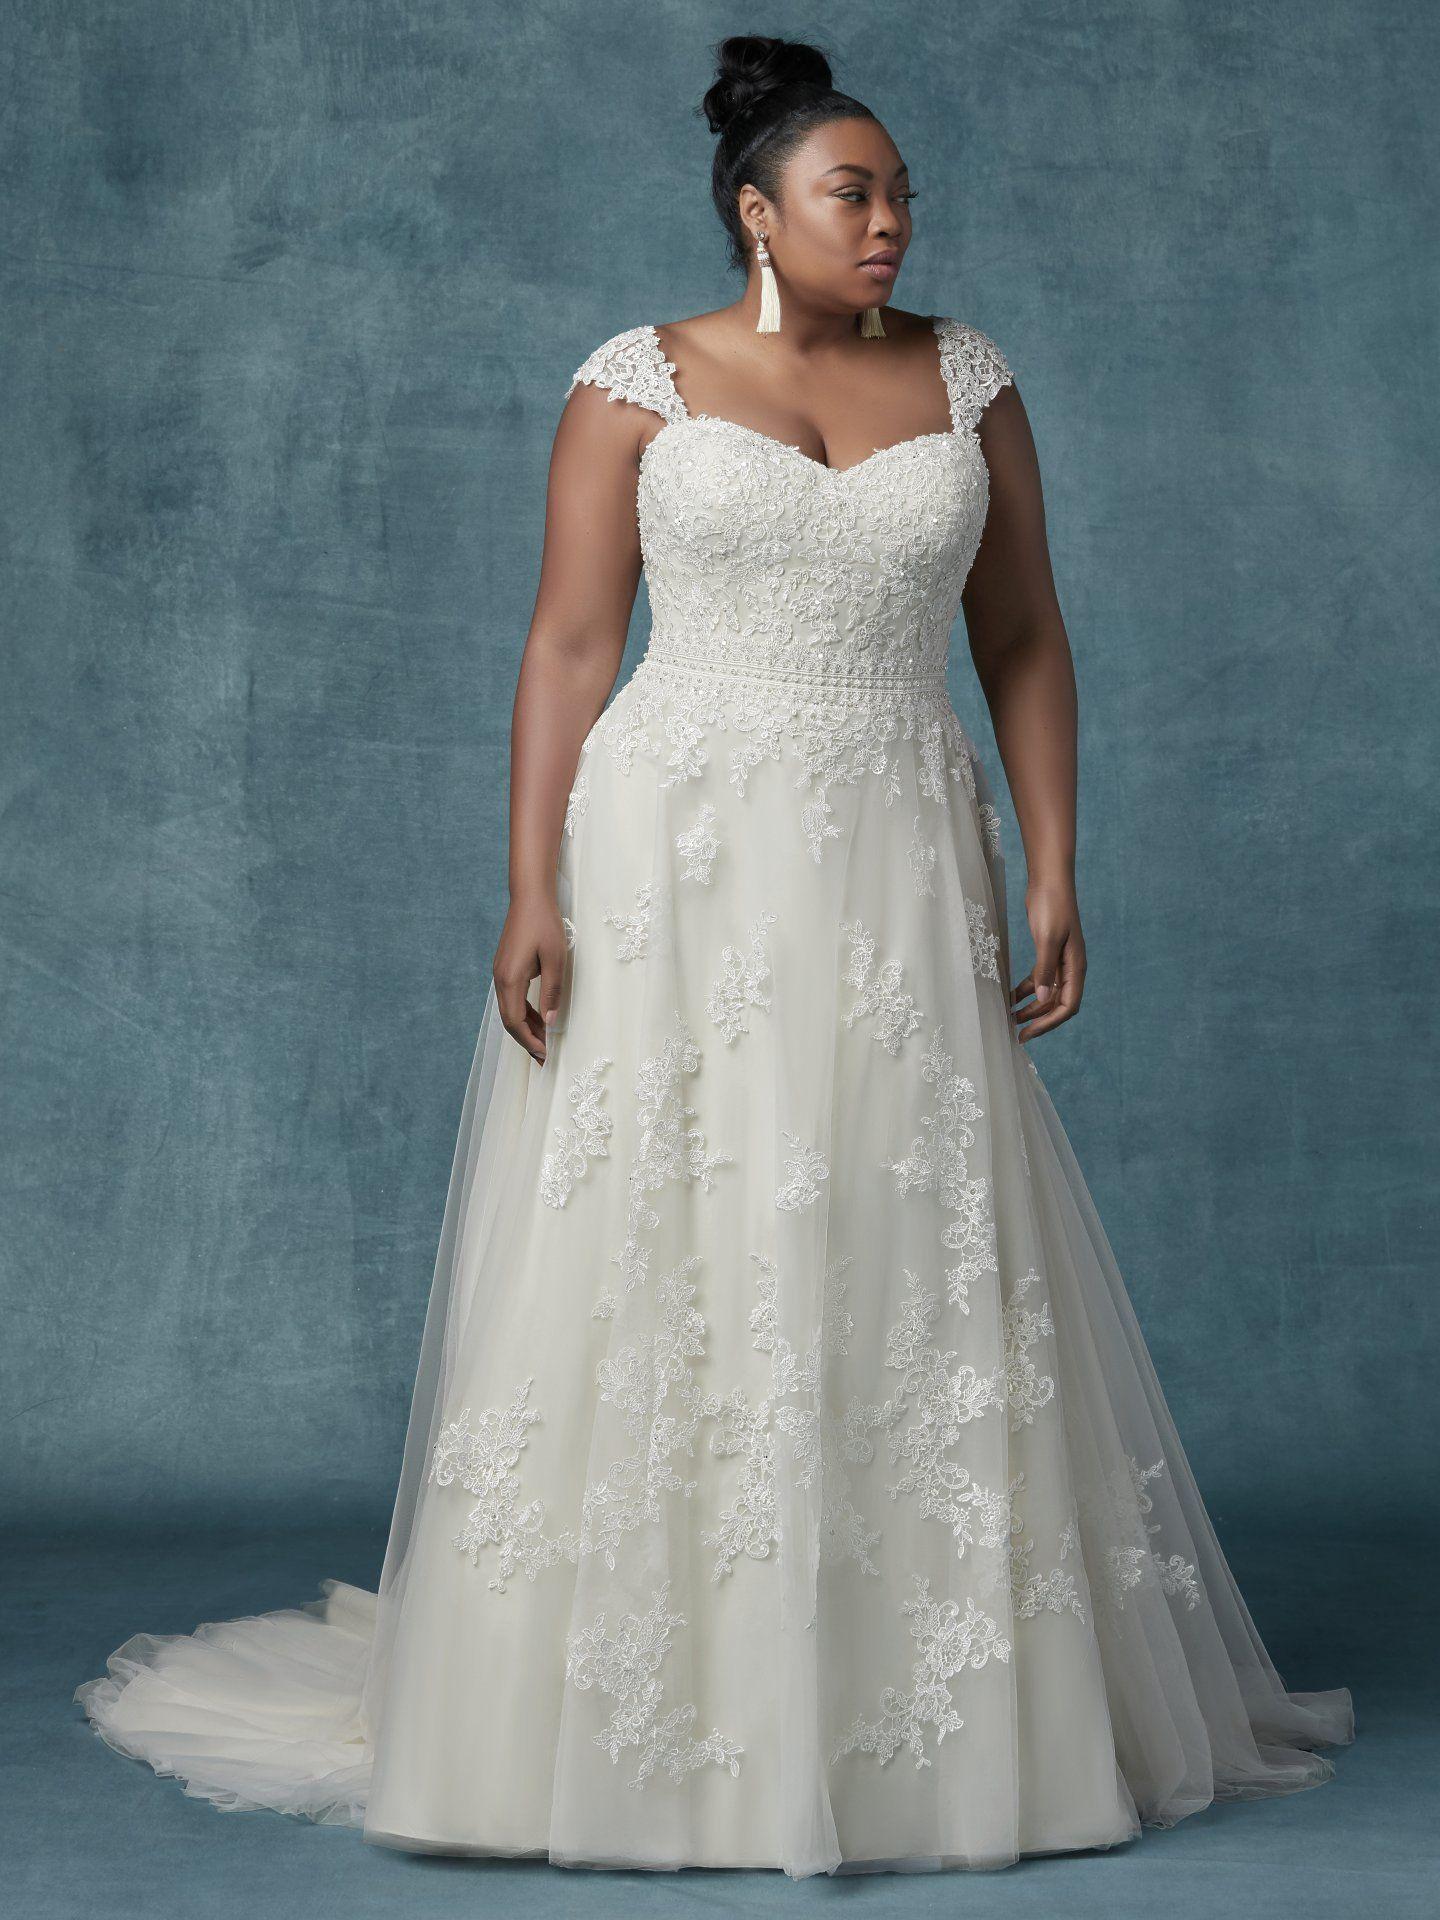 ec042b94a5b Maggie Sottero Wedding Dress Prices Australia - Data Dynamic AG